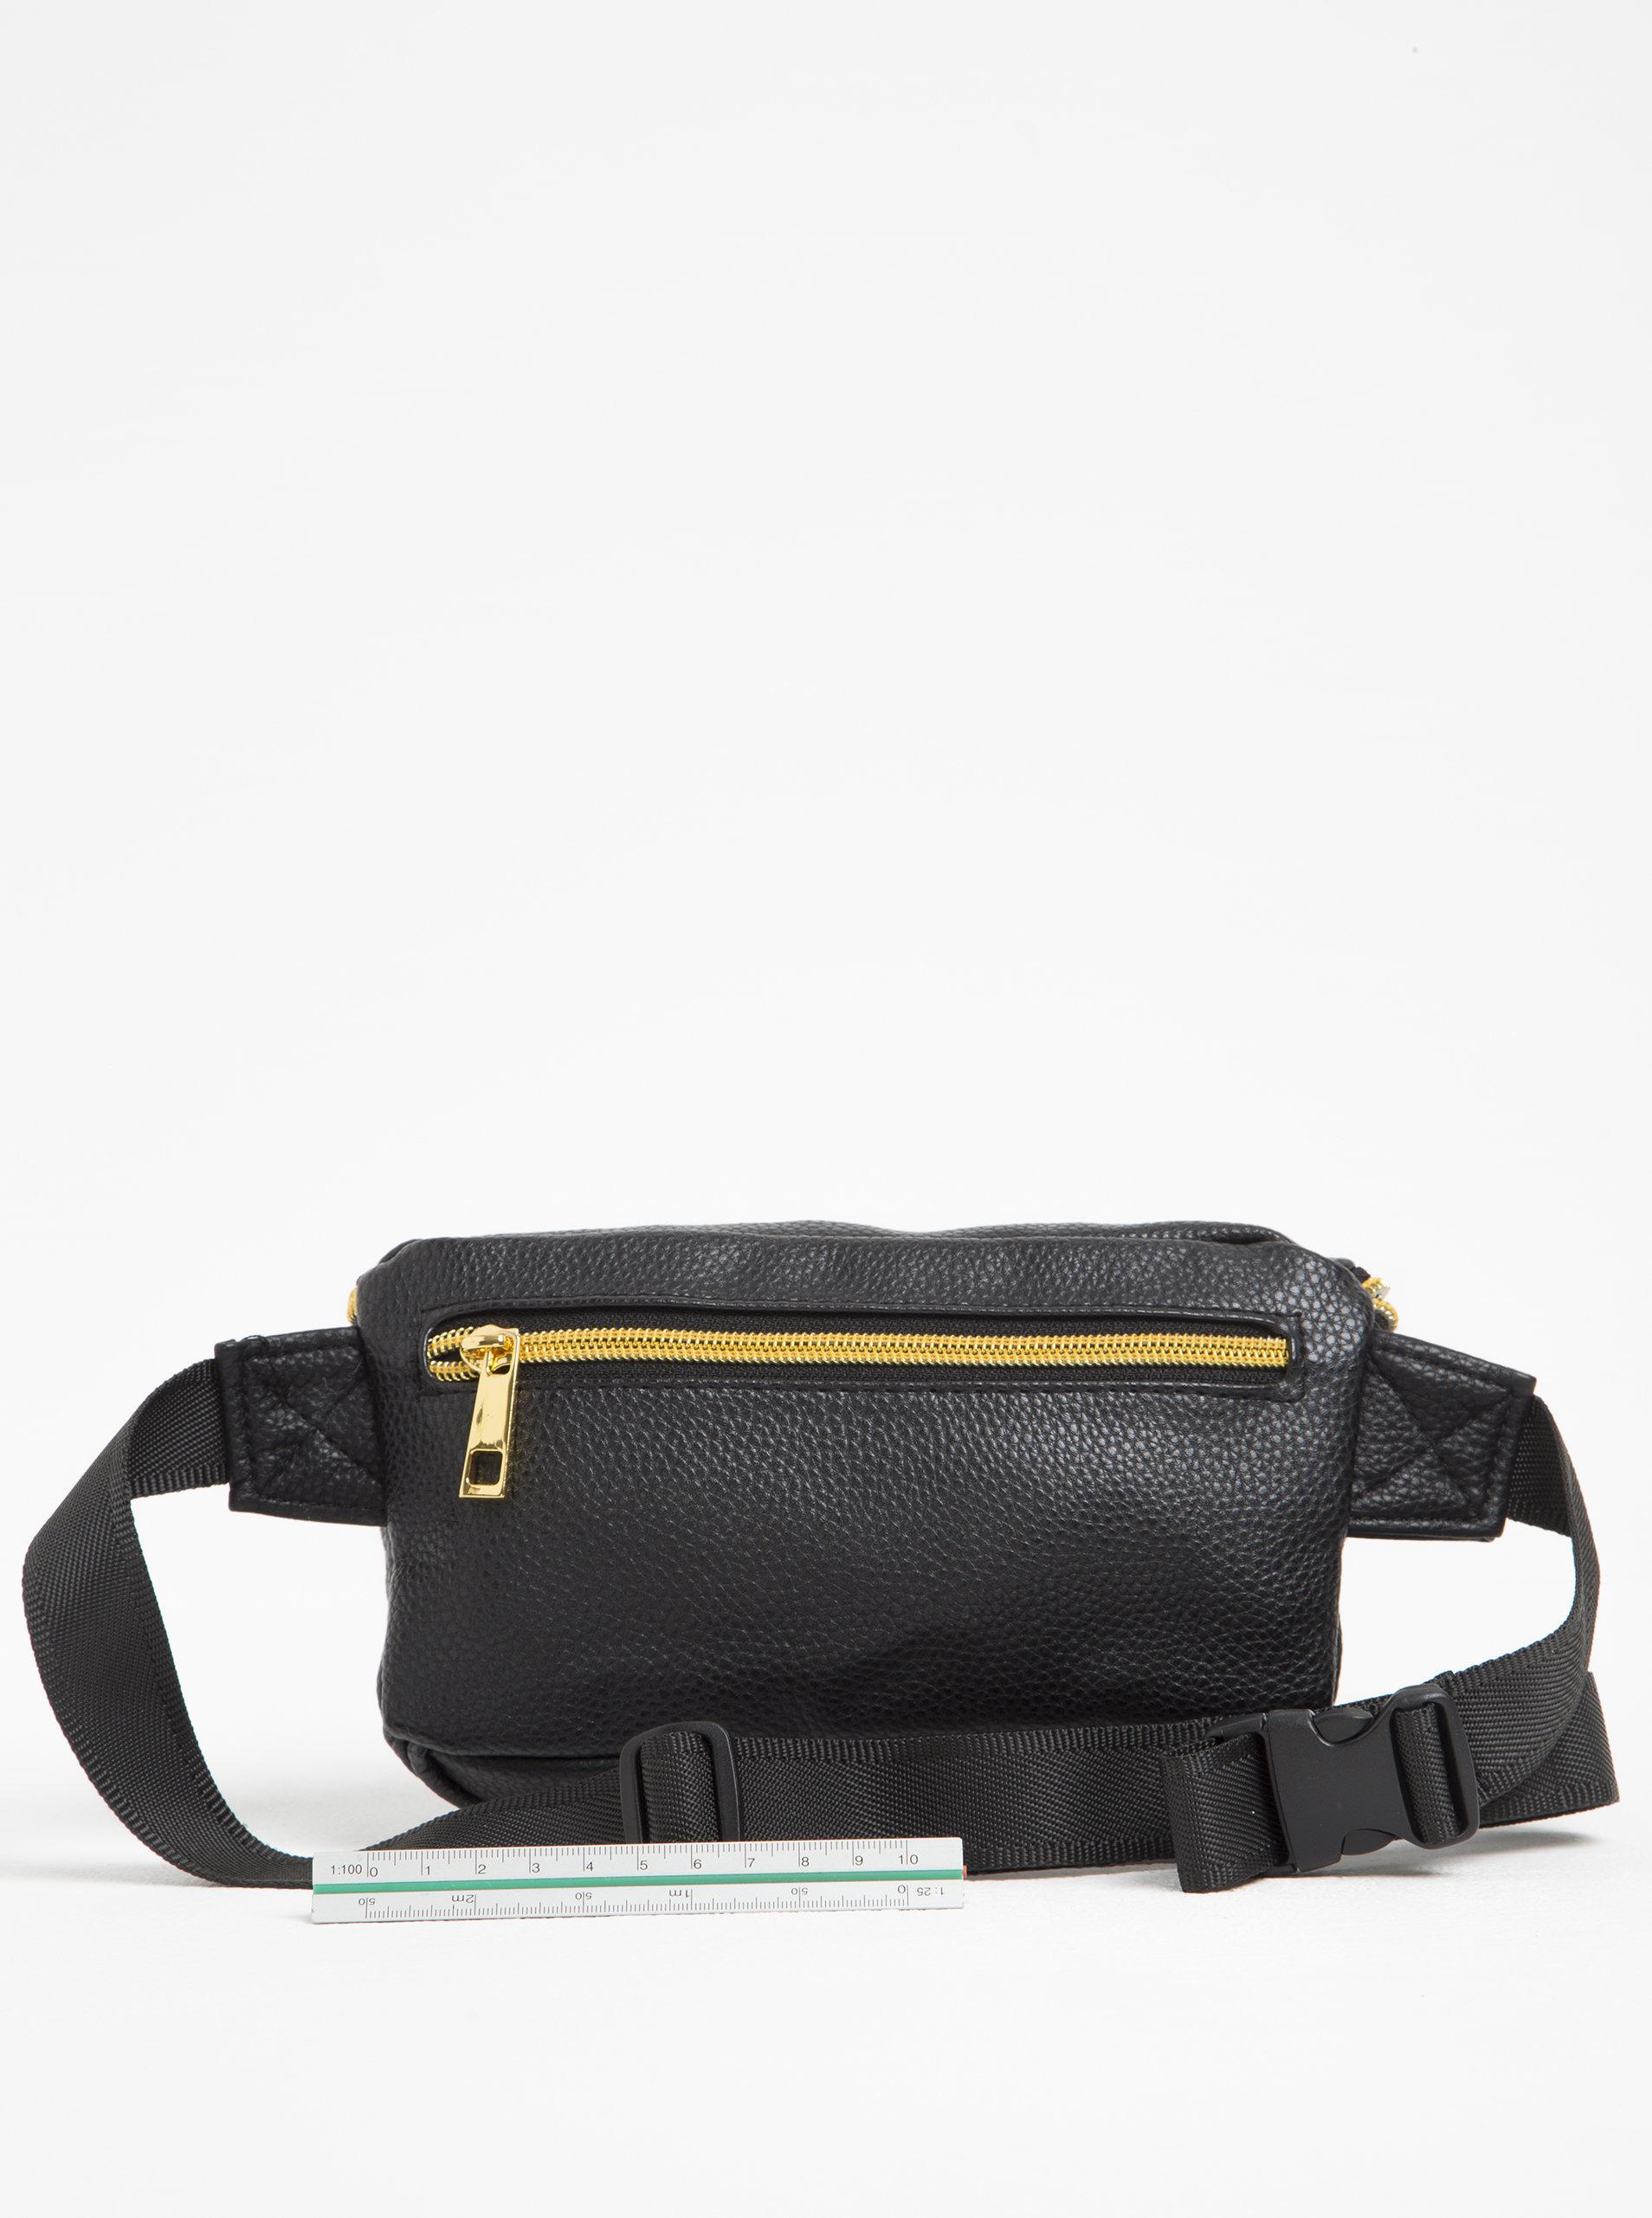 Černá dámská koženková ledvinka Mi-Pac Bum Bag Tumbled ... 2d719a6194